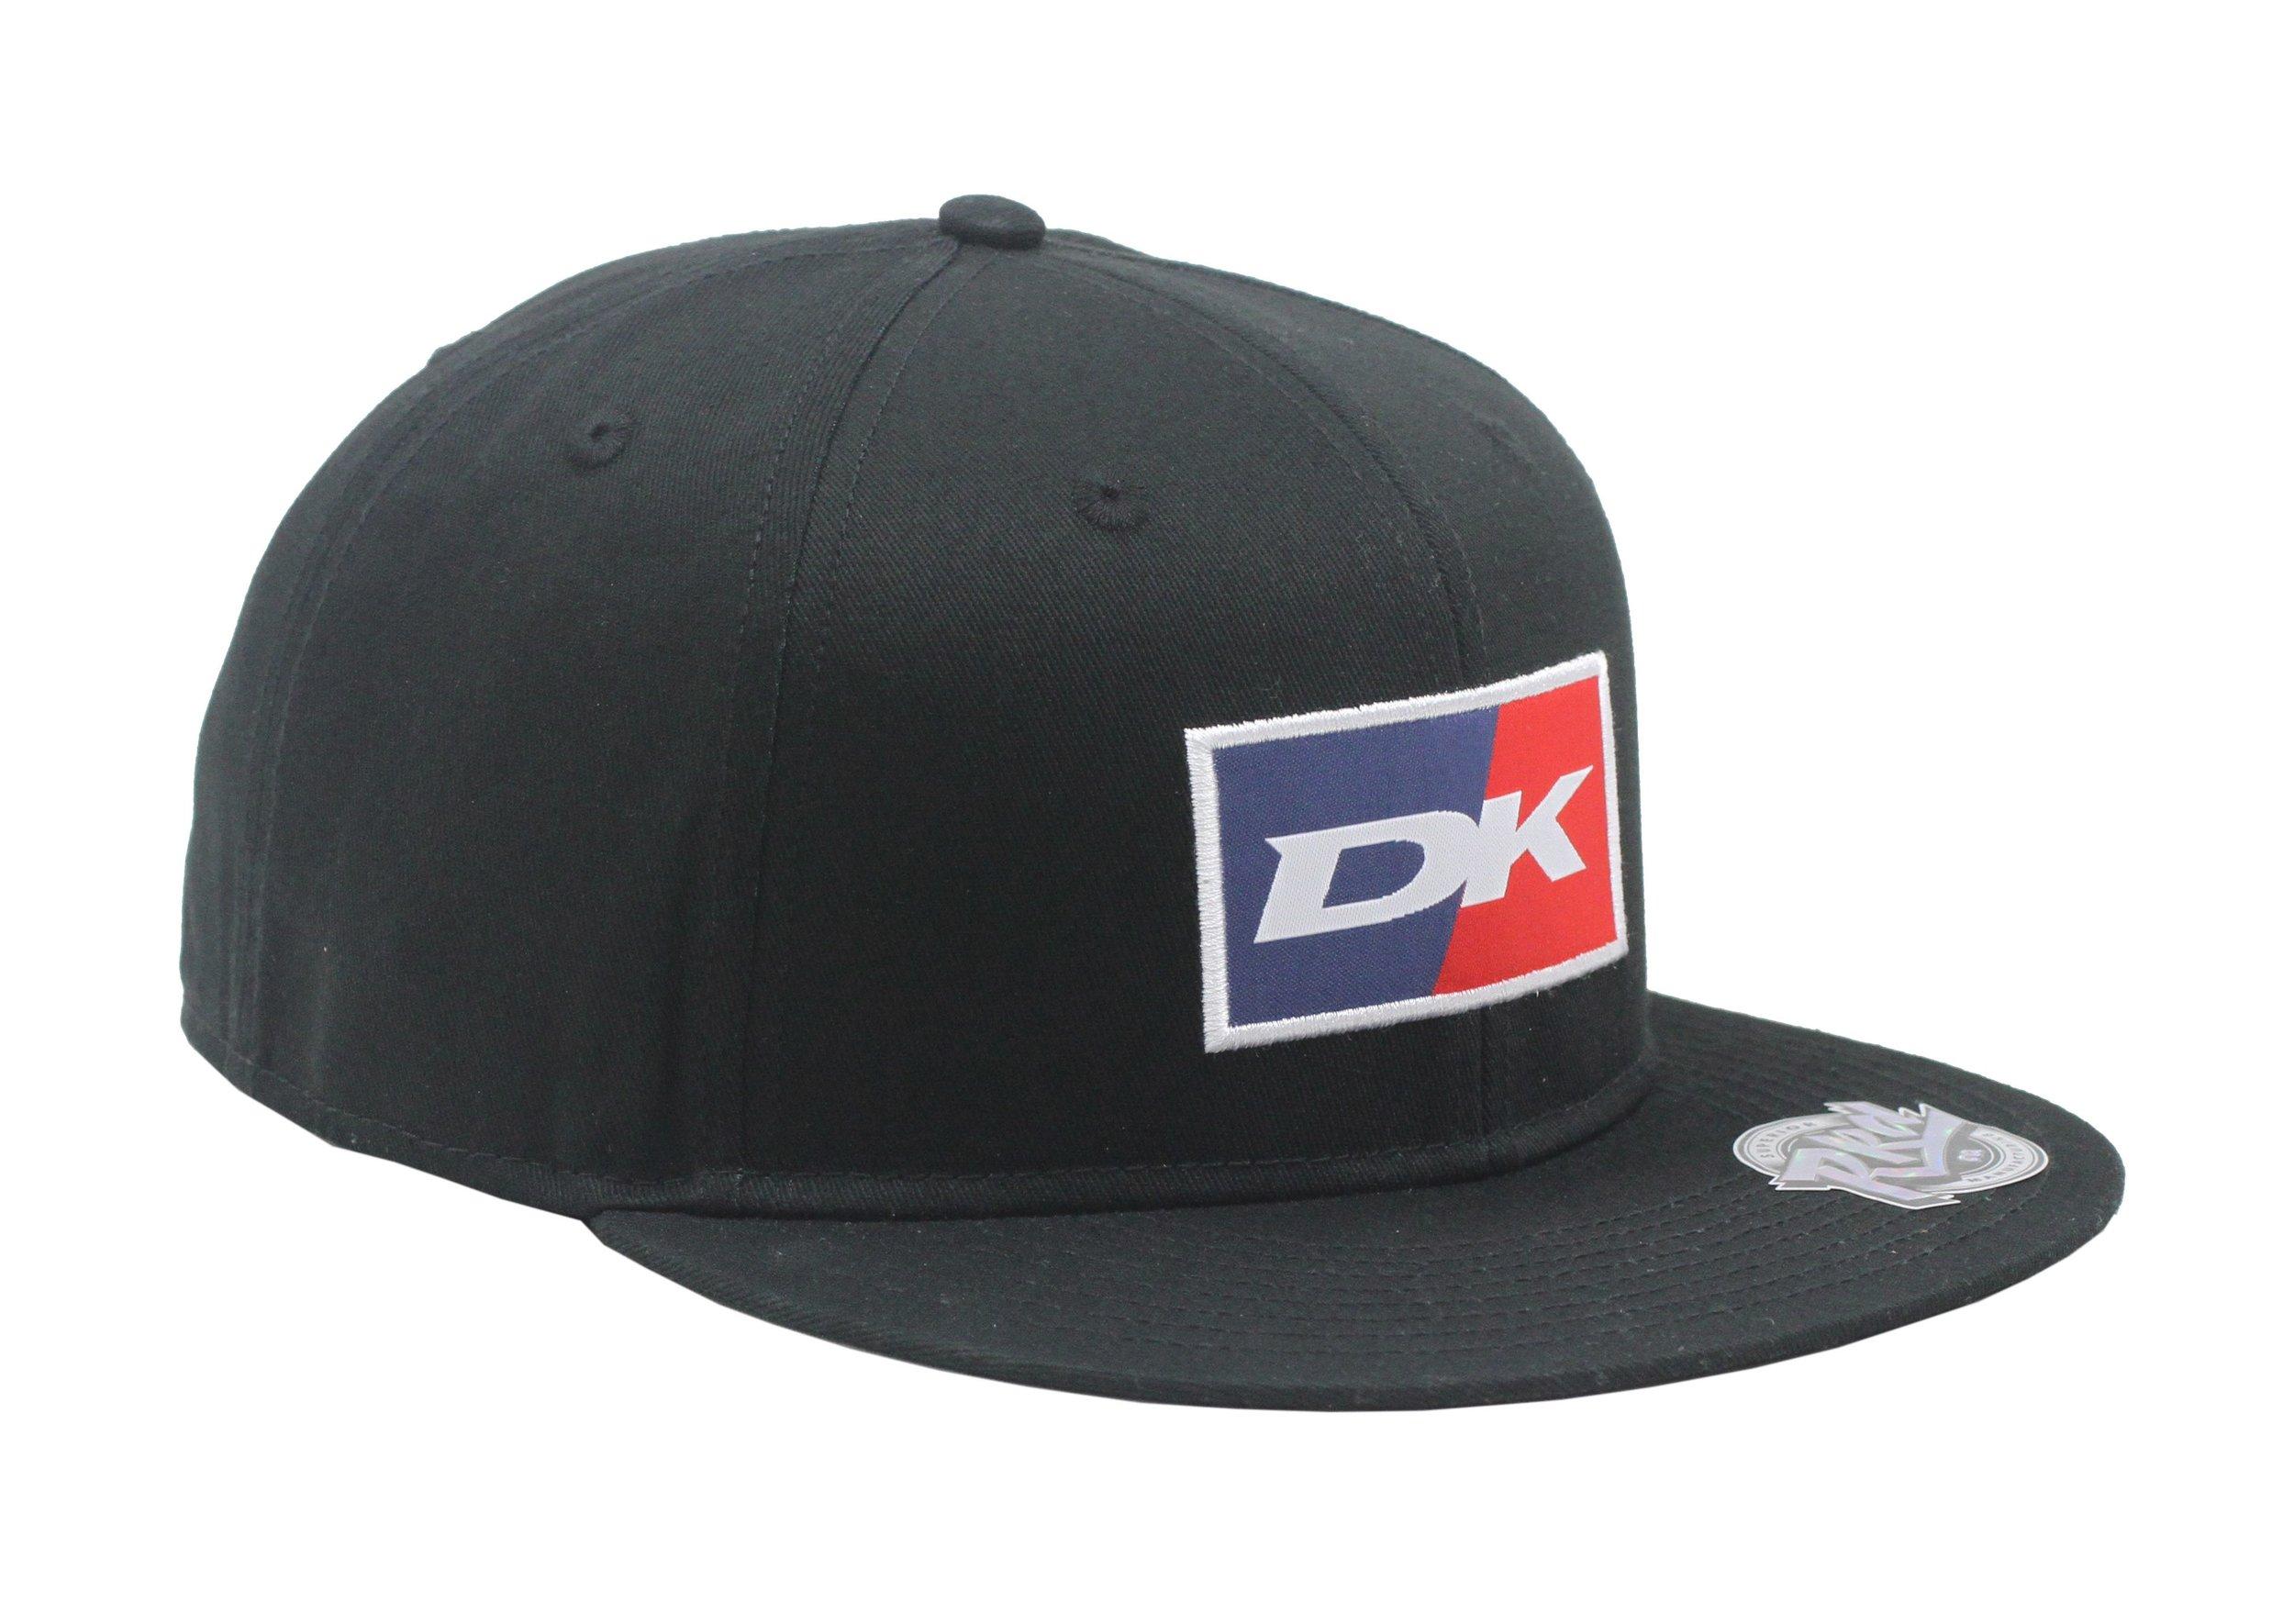 DK split logo cap side.jpg